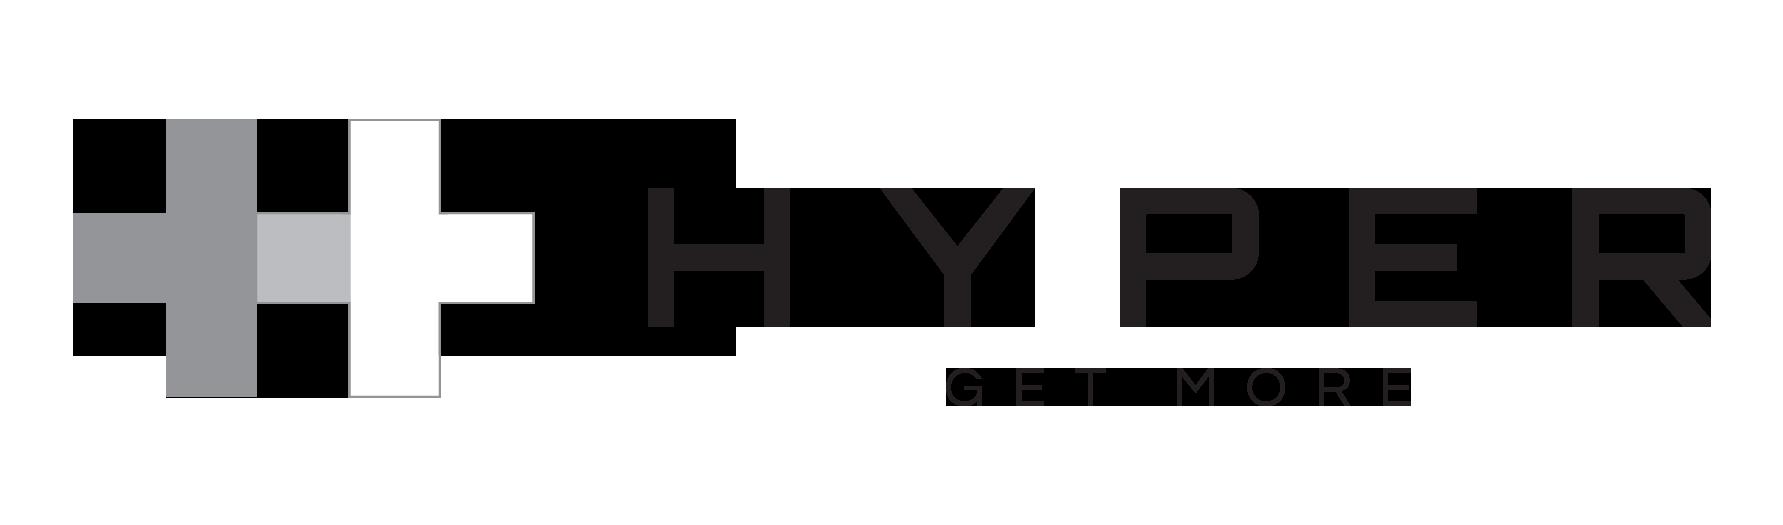 Hyperdrive Thunderbolt 3.0 Hub